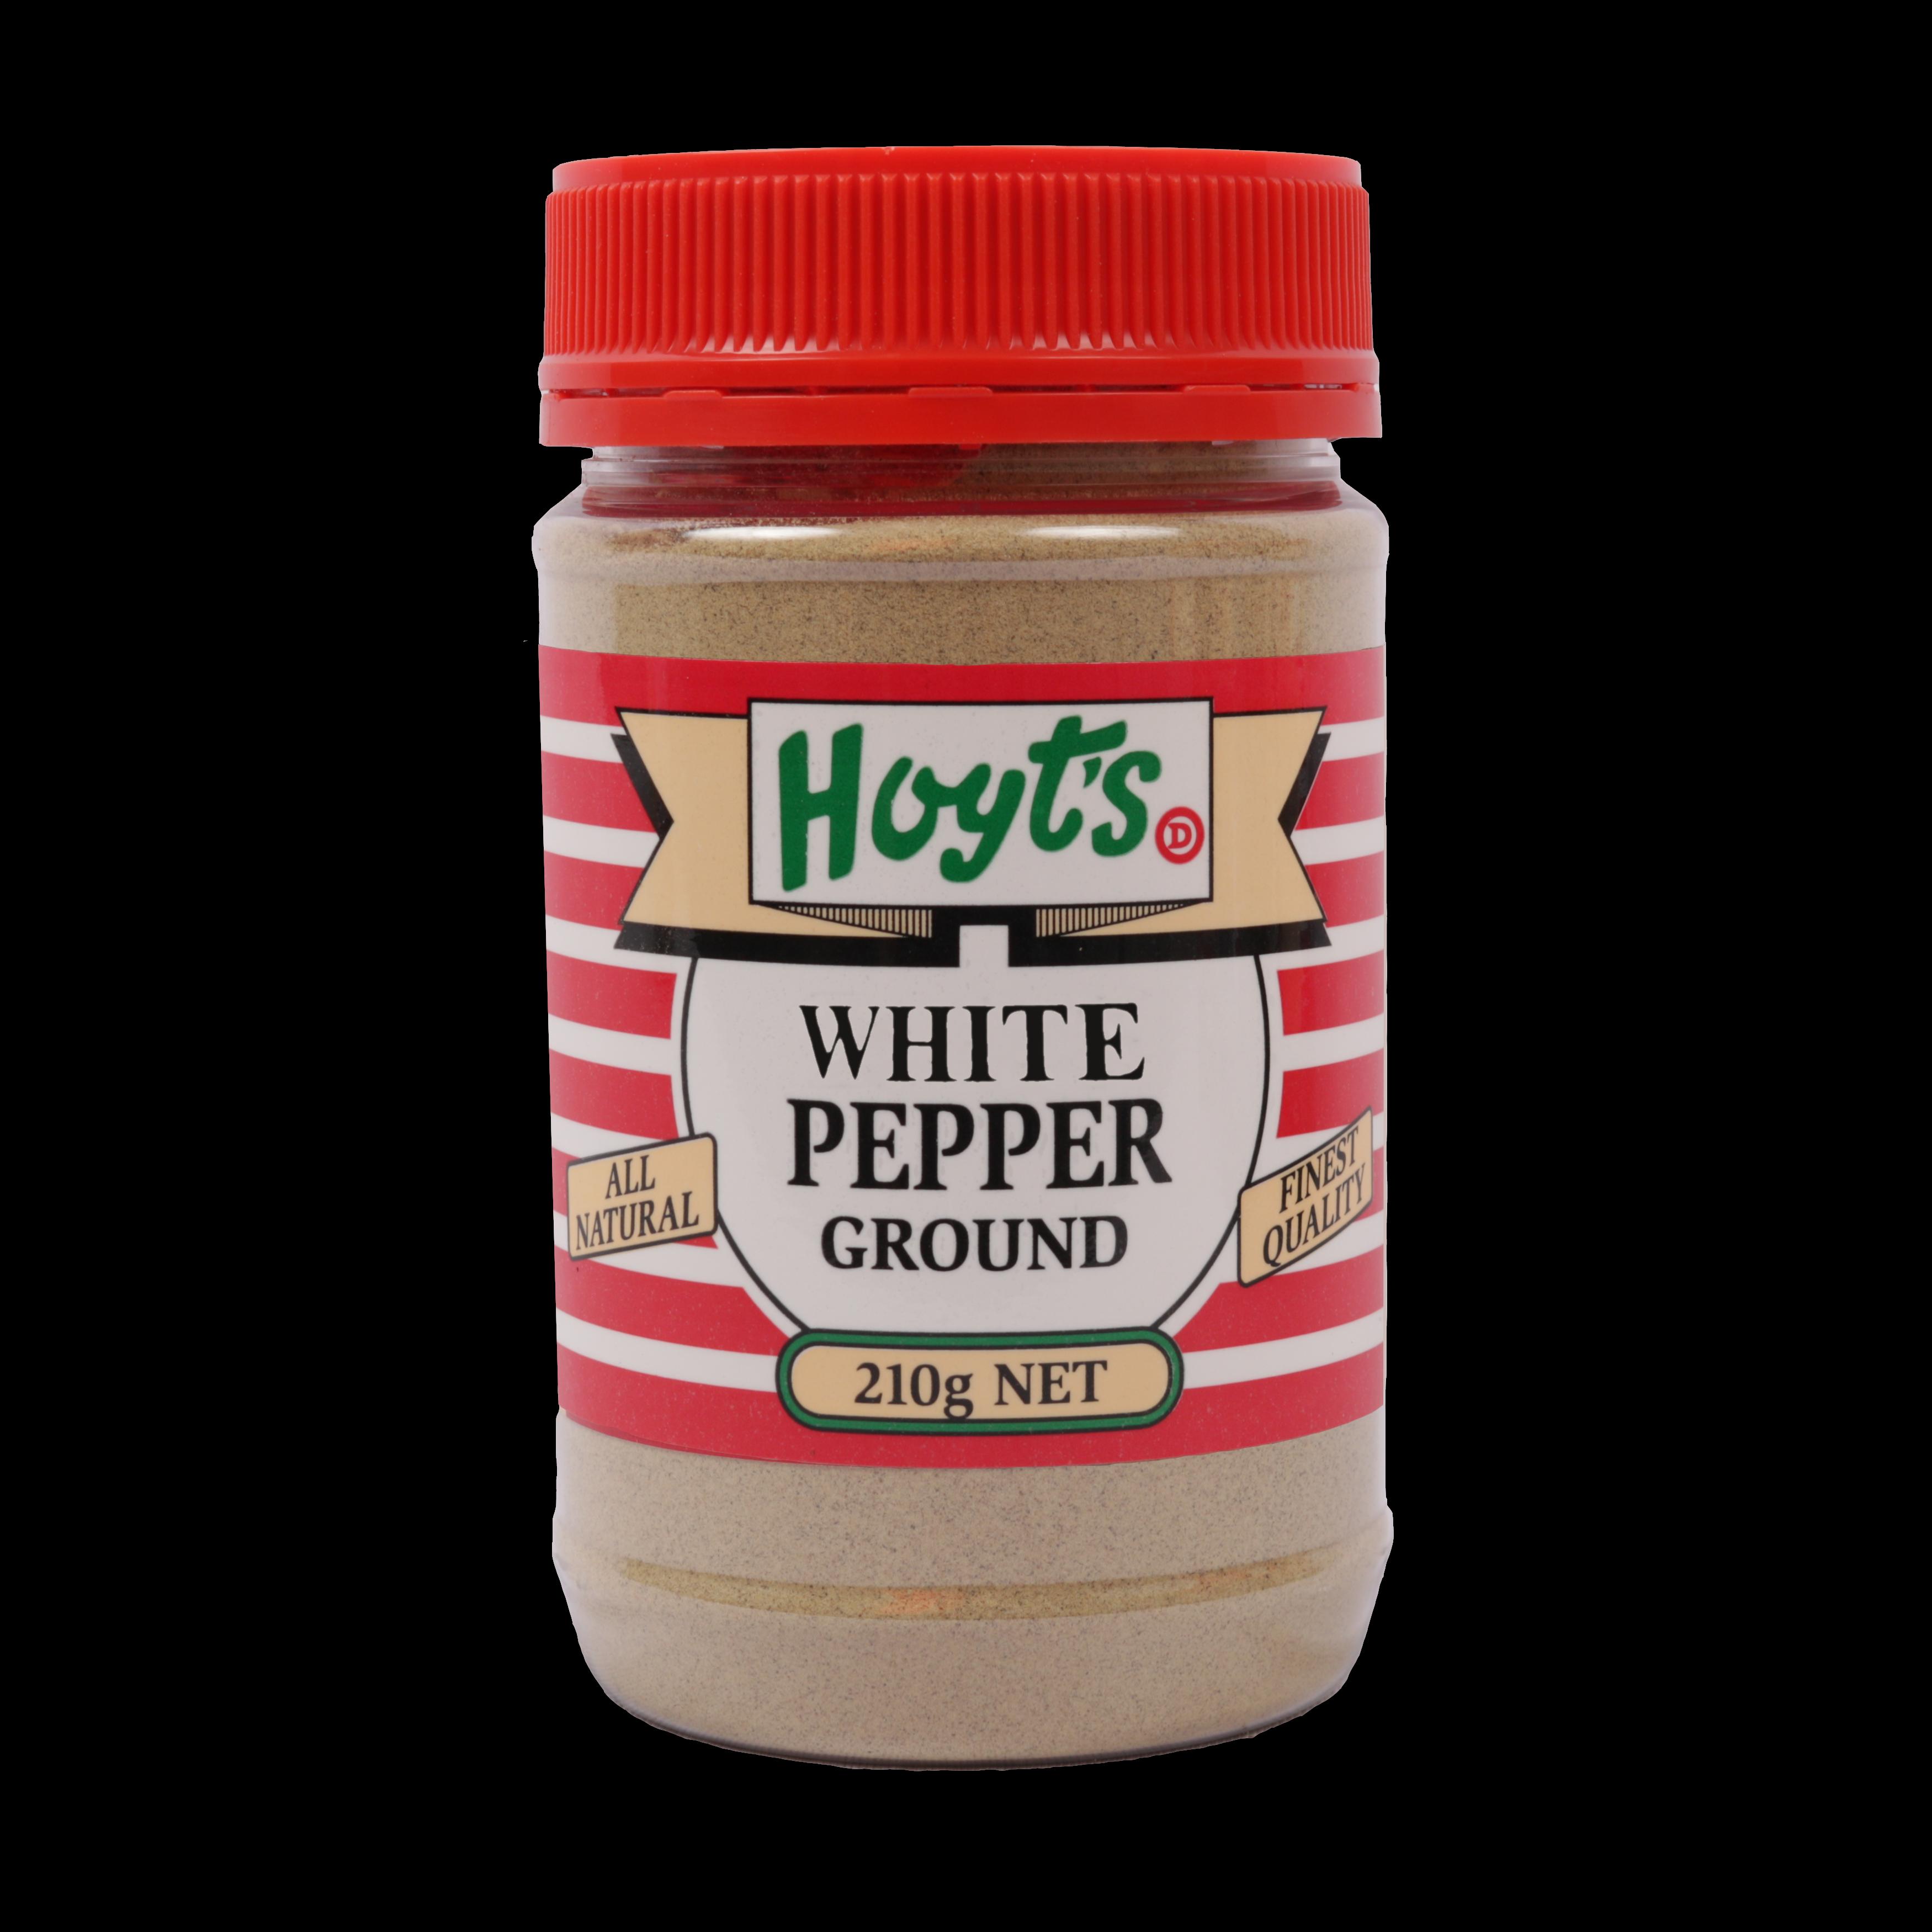 Hoyts White Pepper Ground 210g